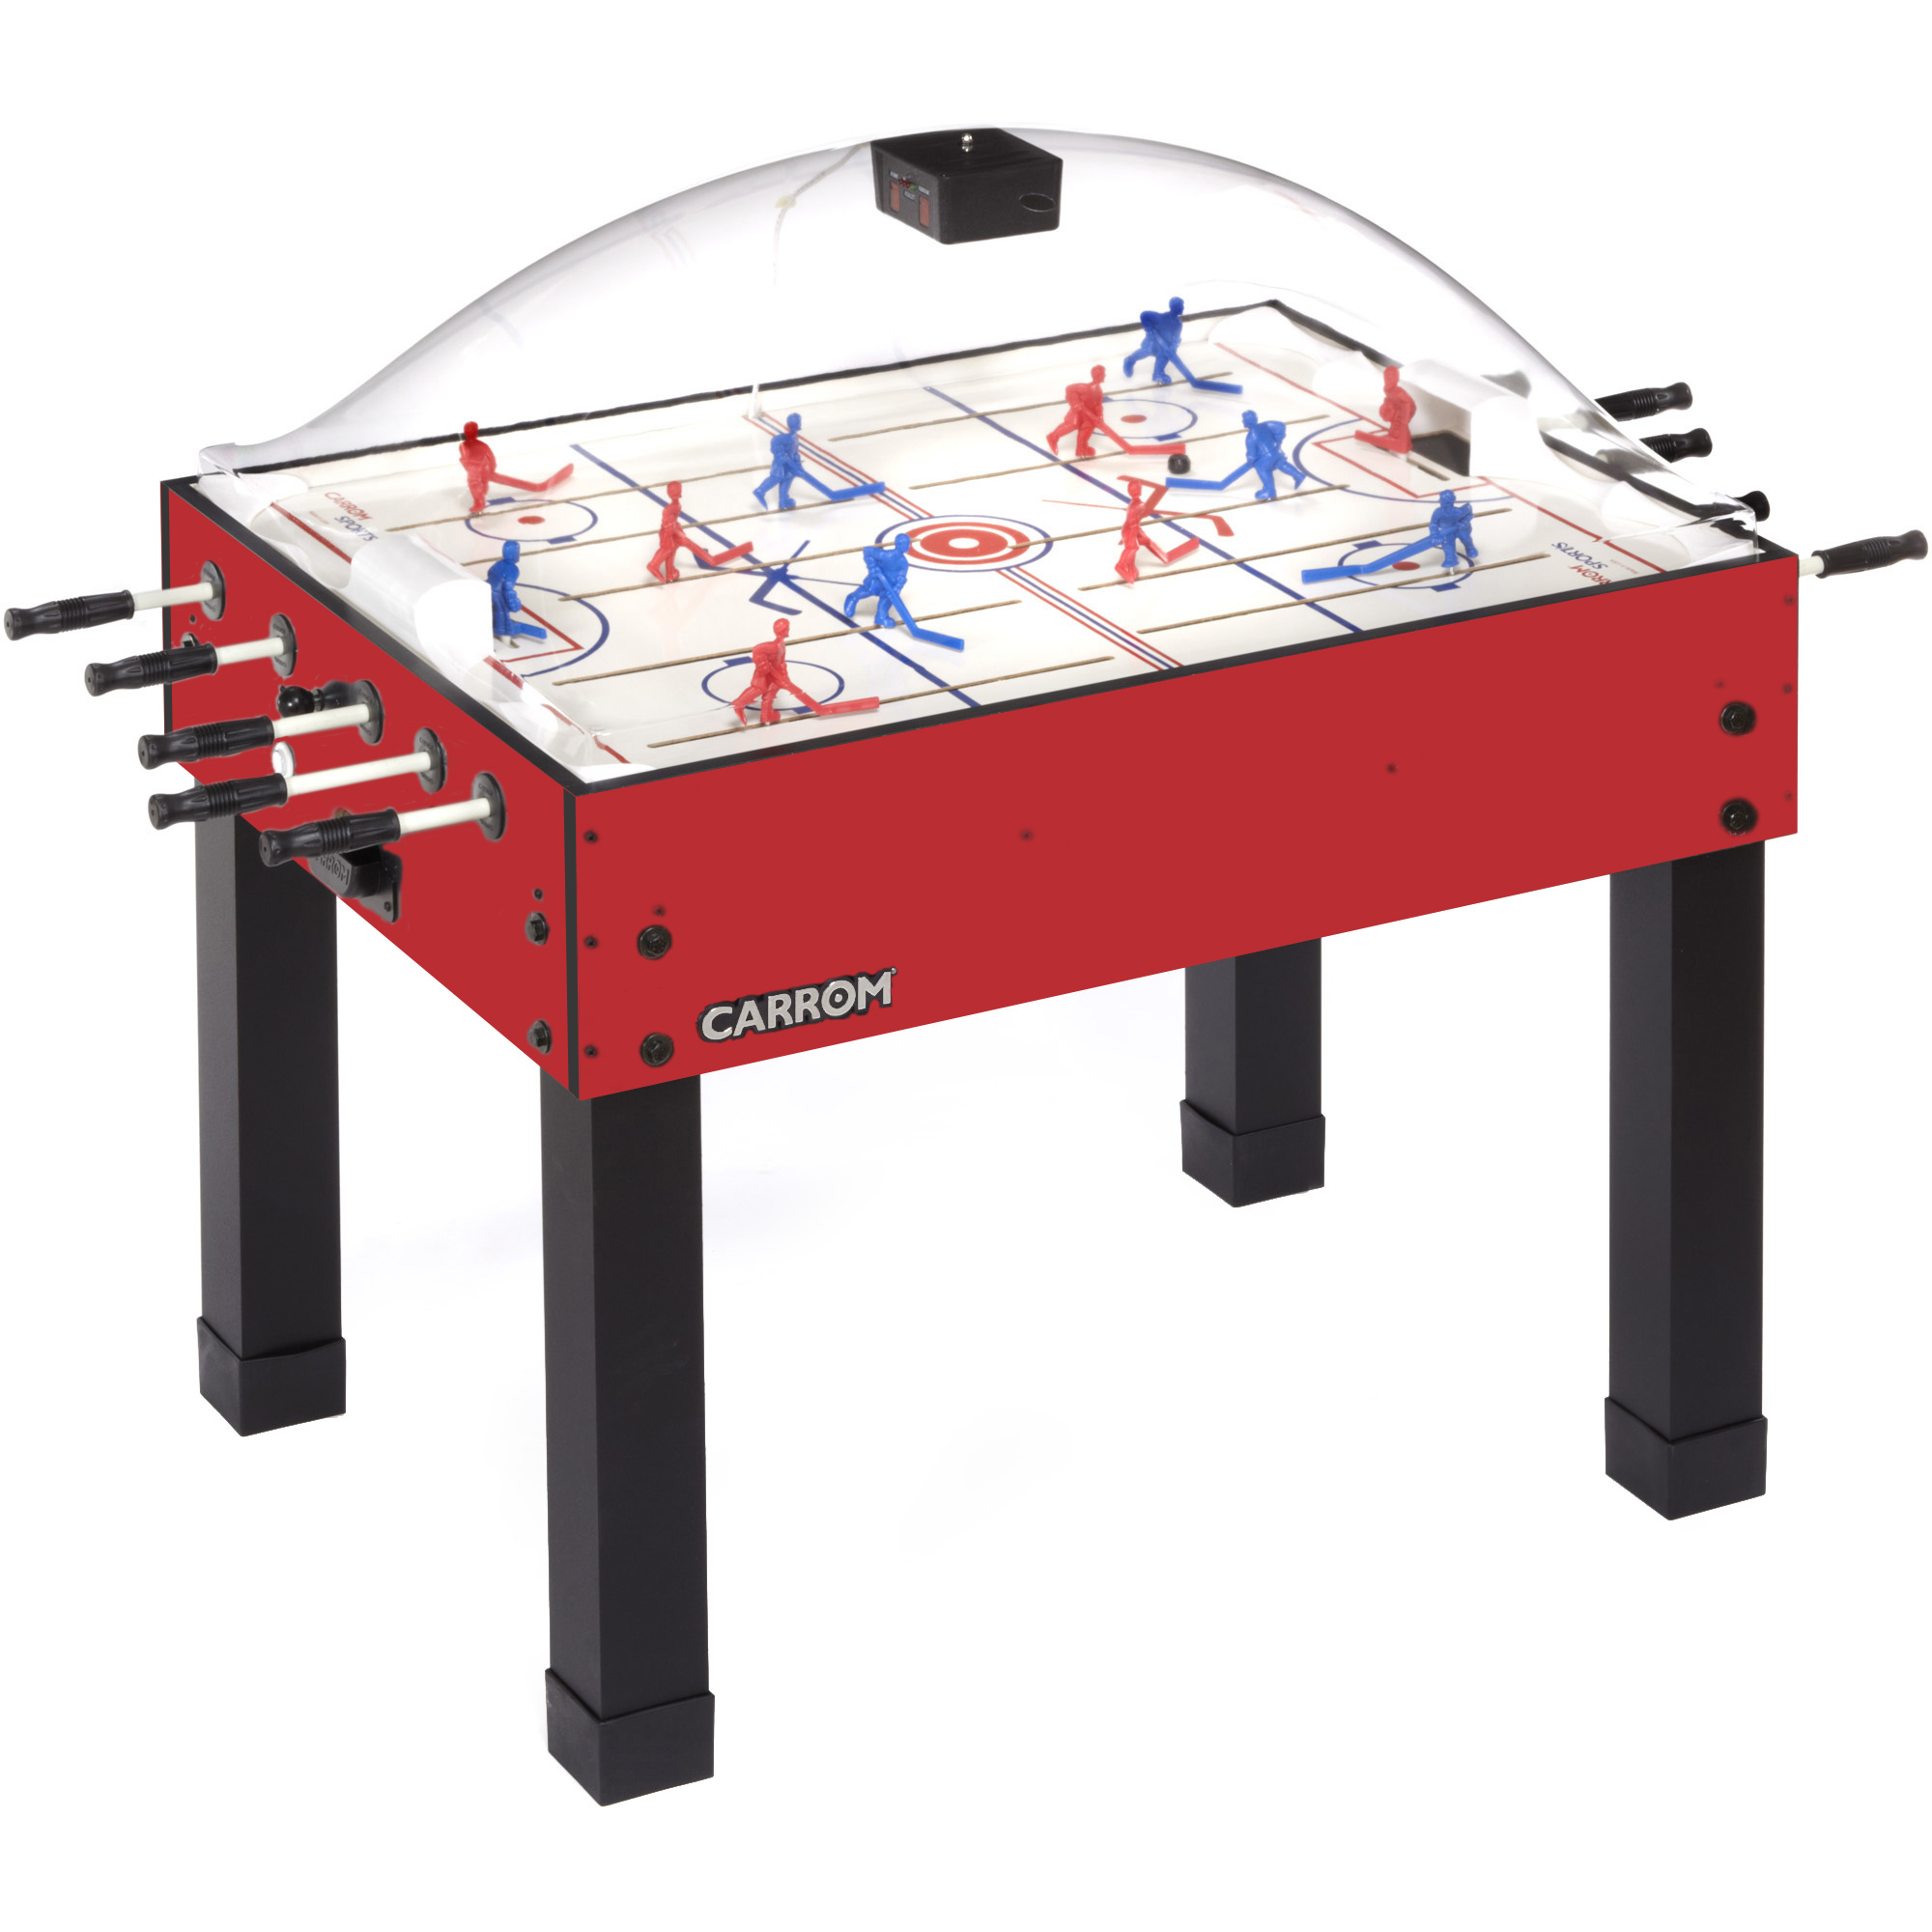 Super Stick Hockey - Red - Carrom Company